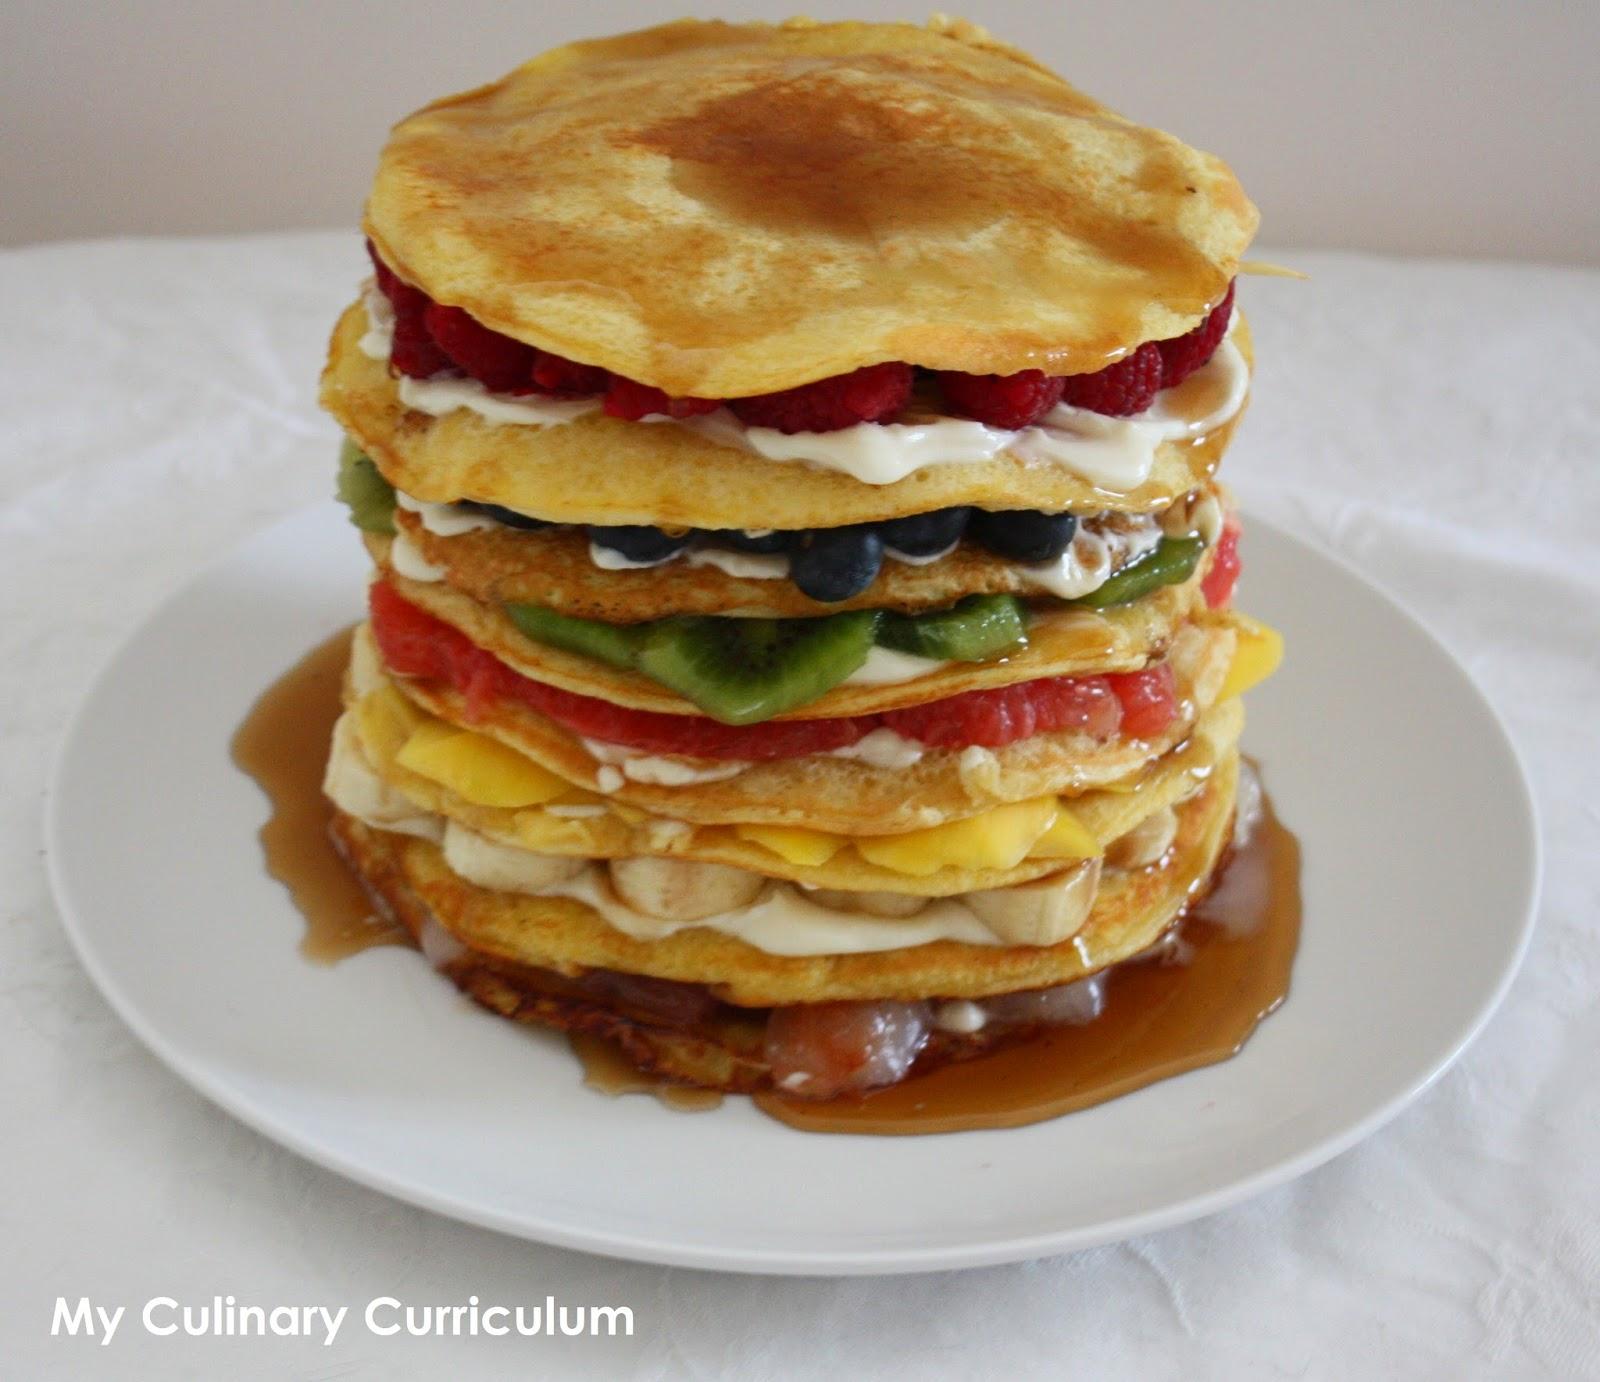 my culinary curriculum g teau de pancakes arc en ciel aux fruits fruits rainbow pancakes cake. Black Bedroom Furniture Sets. Home Design Ideas